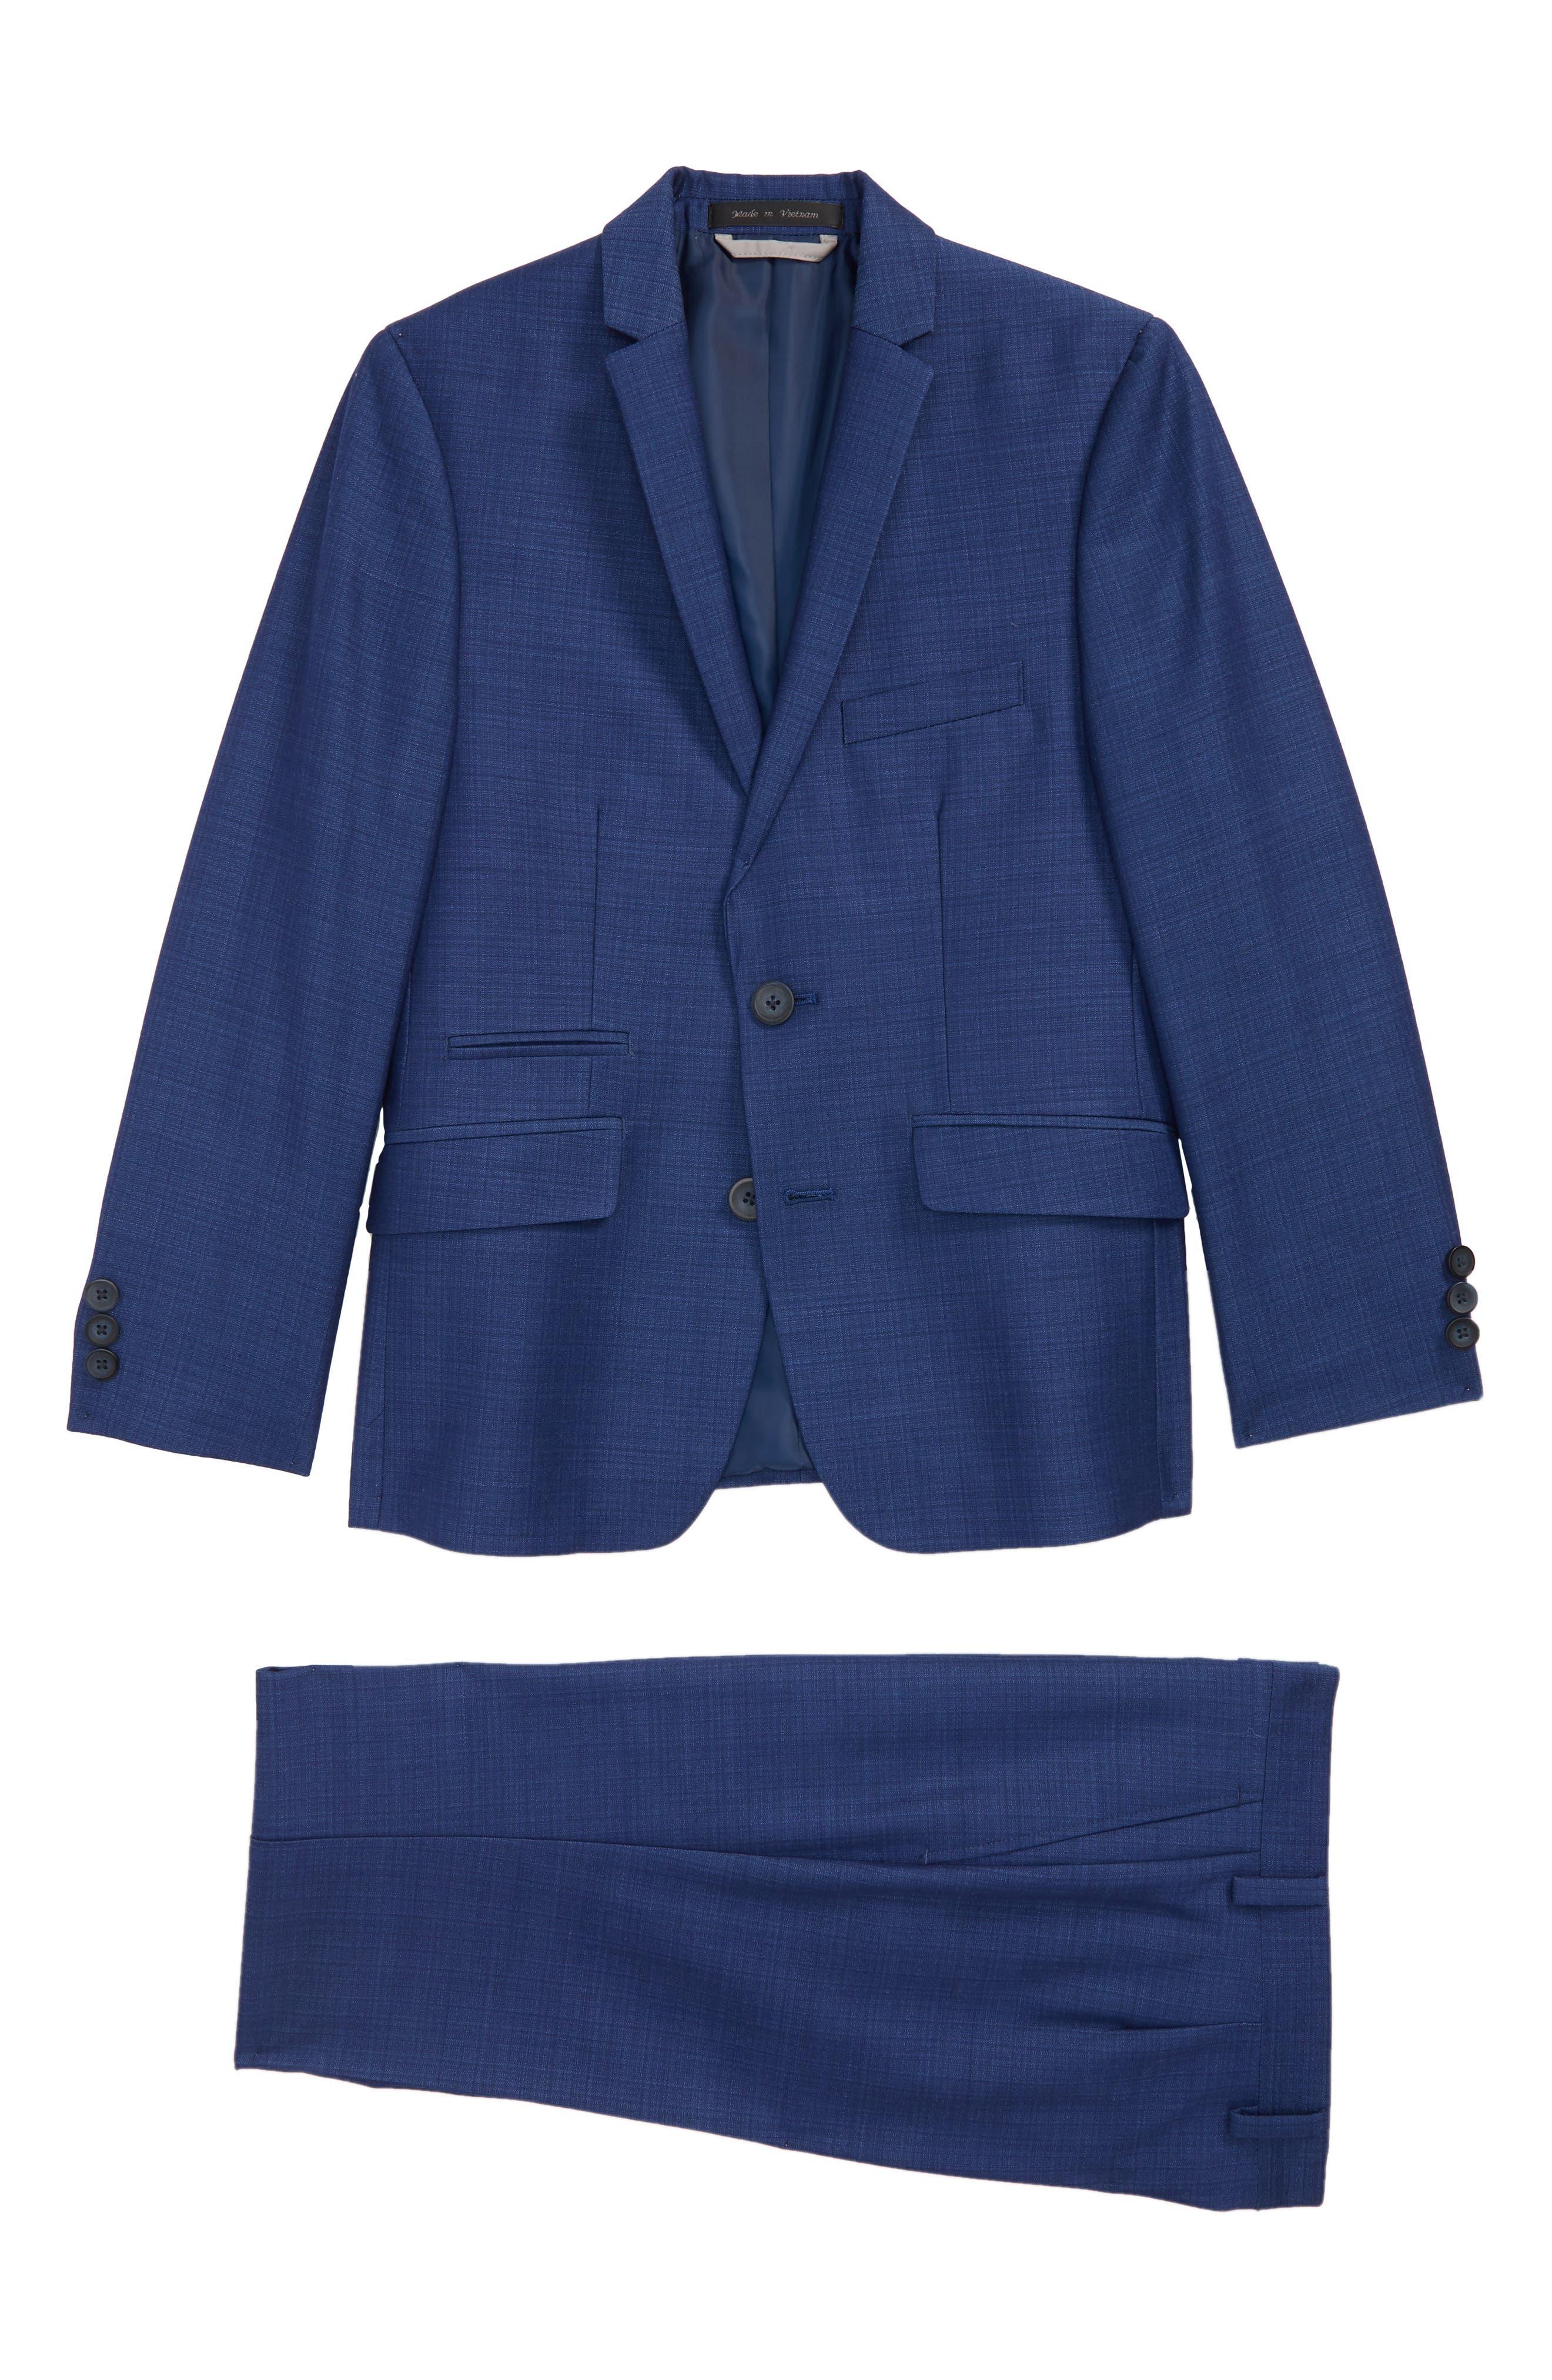 Textured Suit,                         Main,                         color, Blue/ Navy